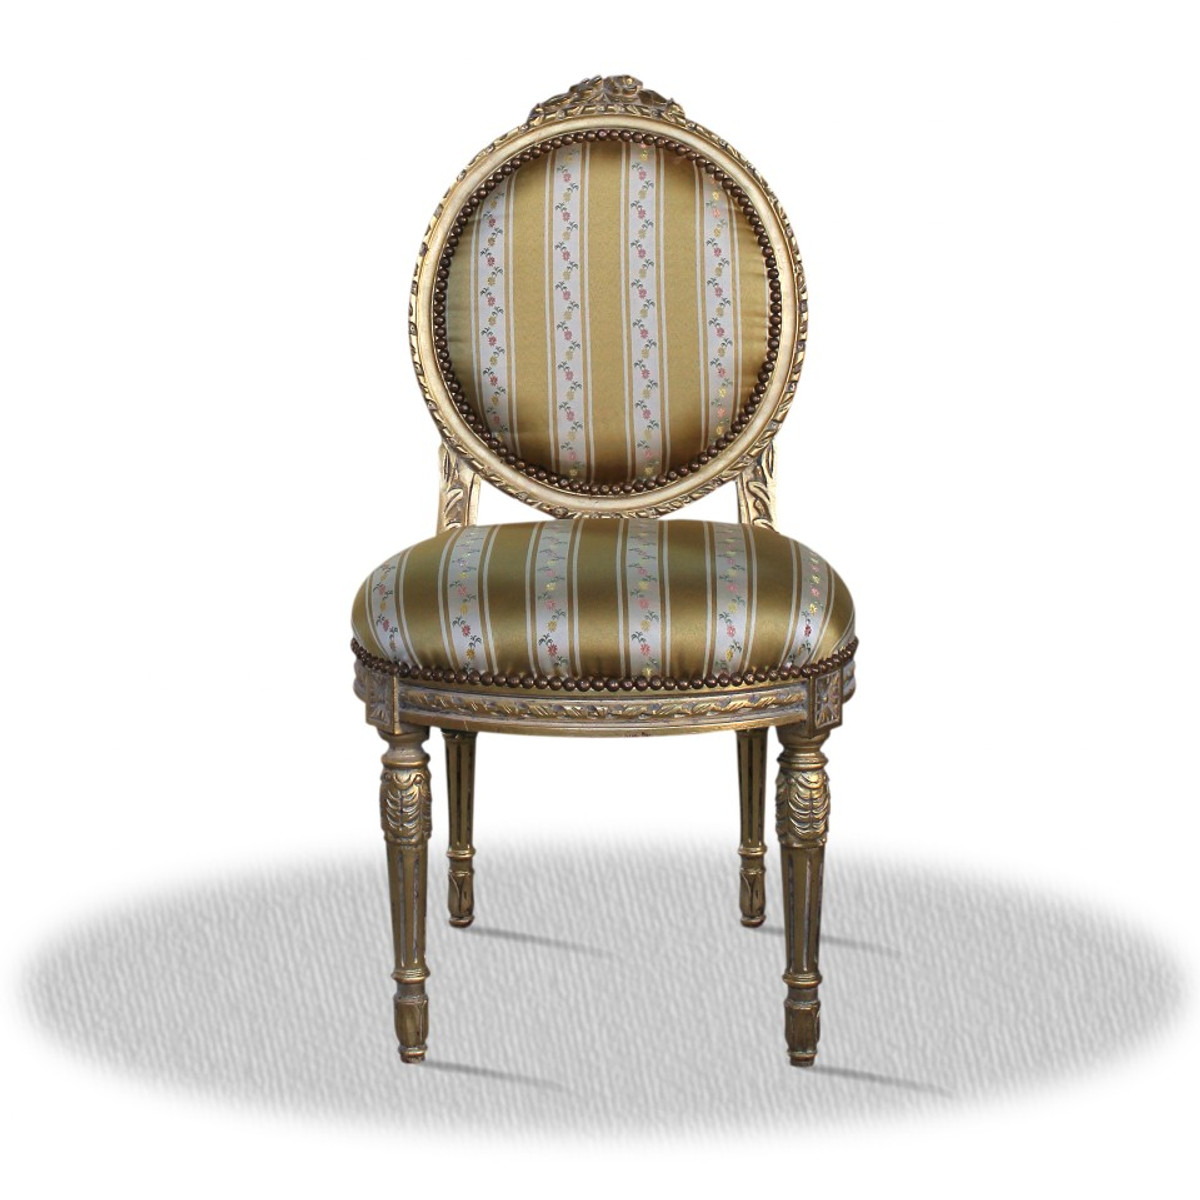 Casa Padrino baroque salon chair vintage gold 50 x 50 x H. 100 cm - Antique  Furniture - Casa Padrino Baroque Salon Chair Vintage Gold 50 X 50 X H. 100 Cm